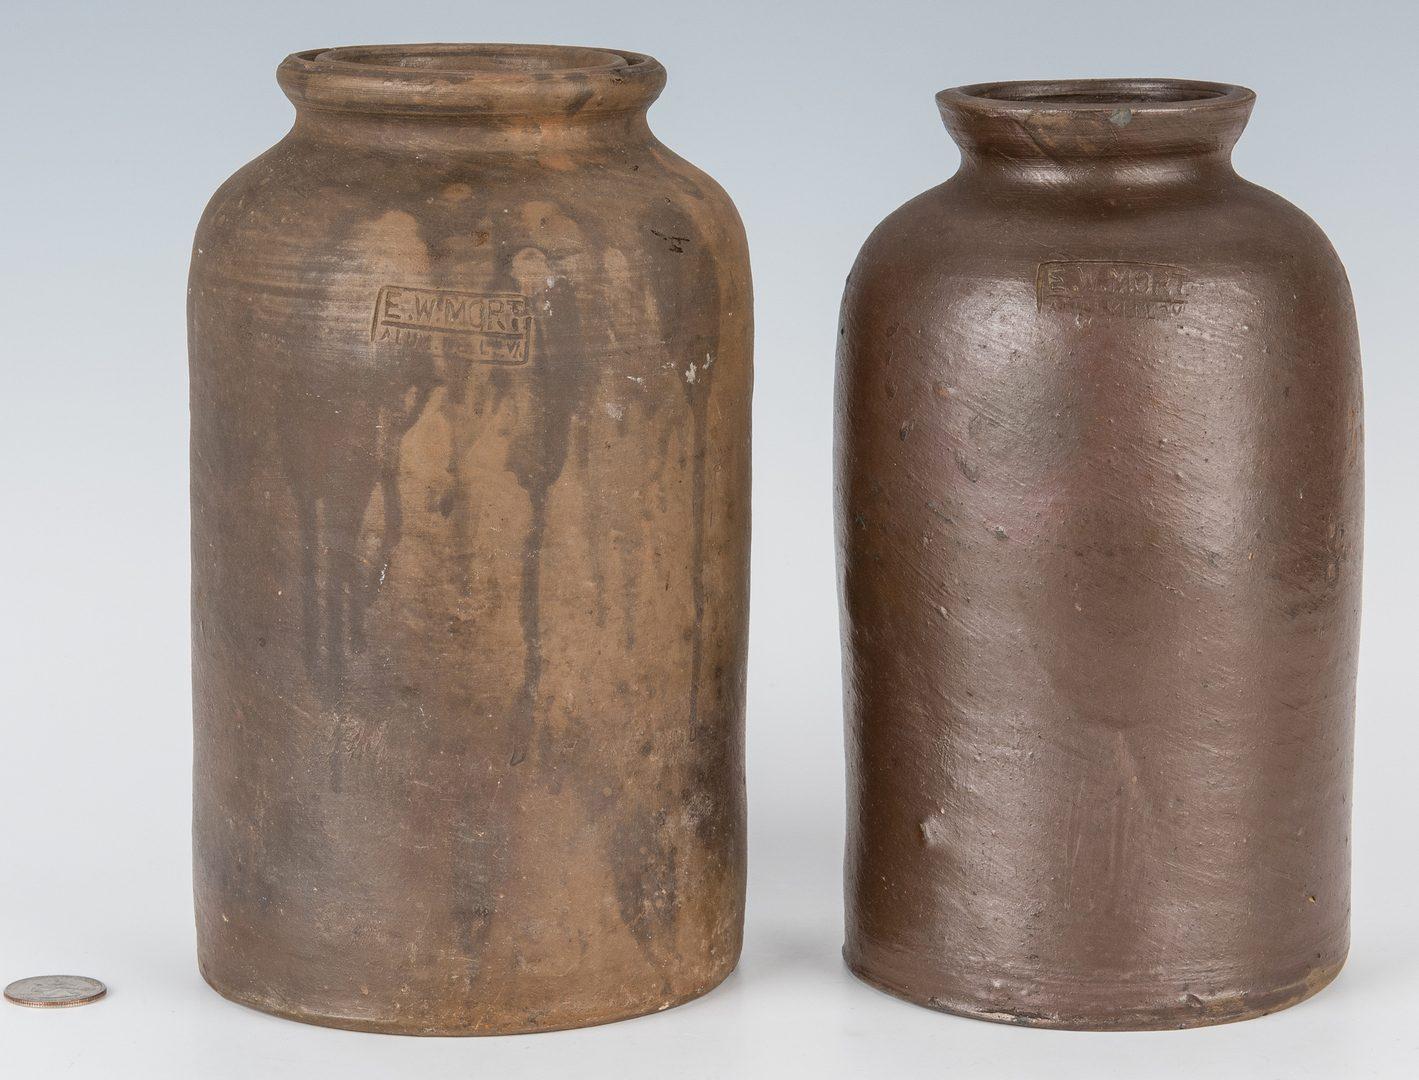 Lot 163: 2 Southwest VA Preserving Jars, E. W. Mort, Exhibited